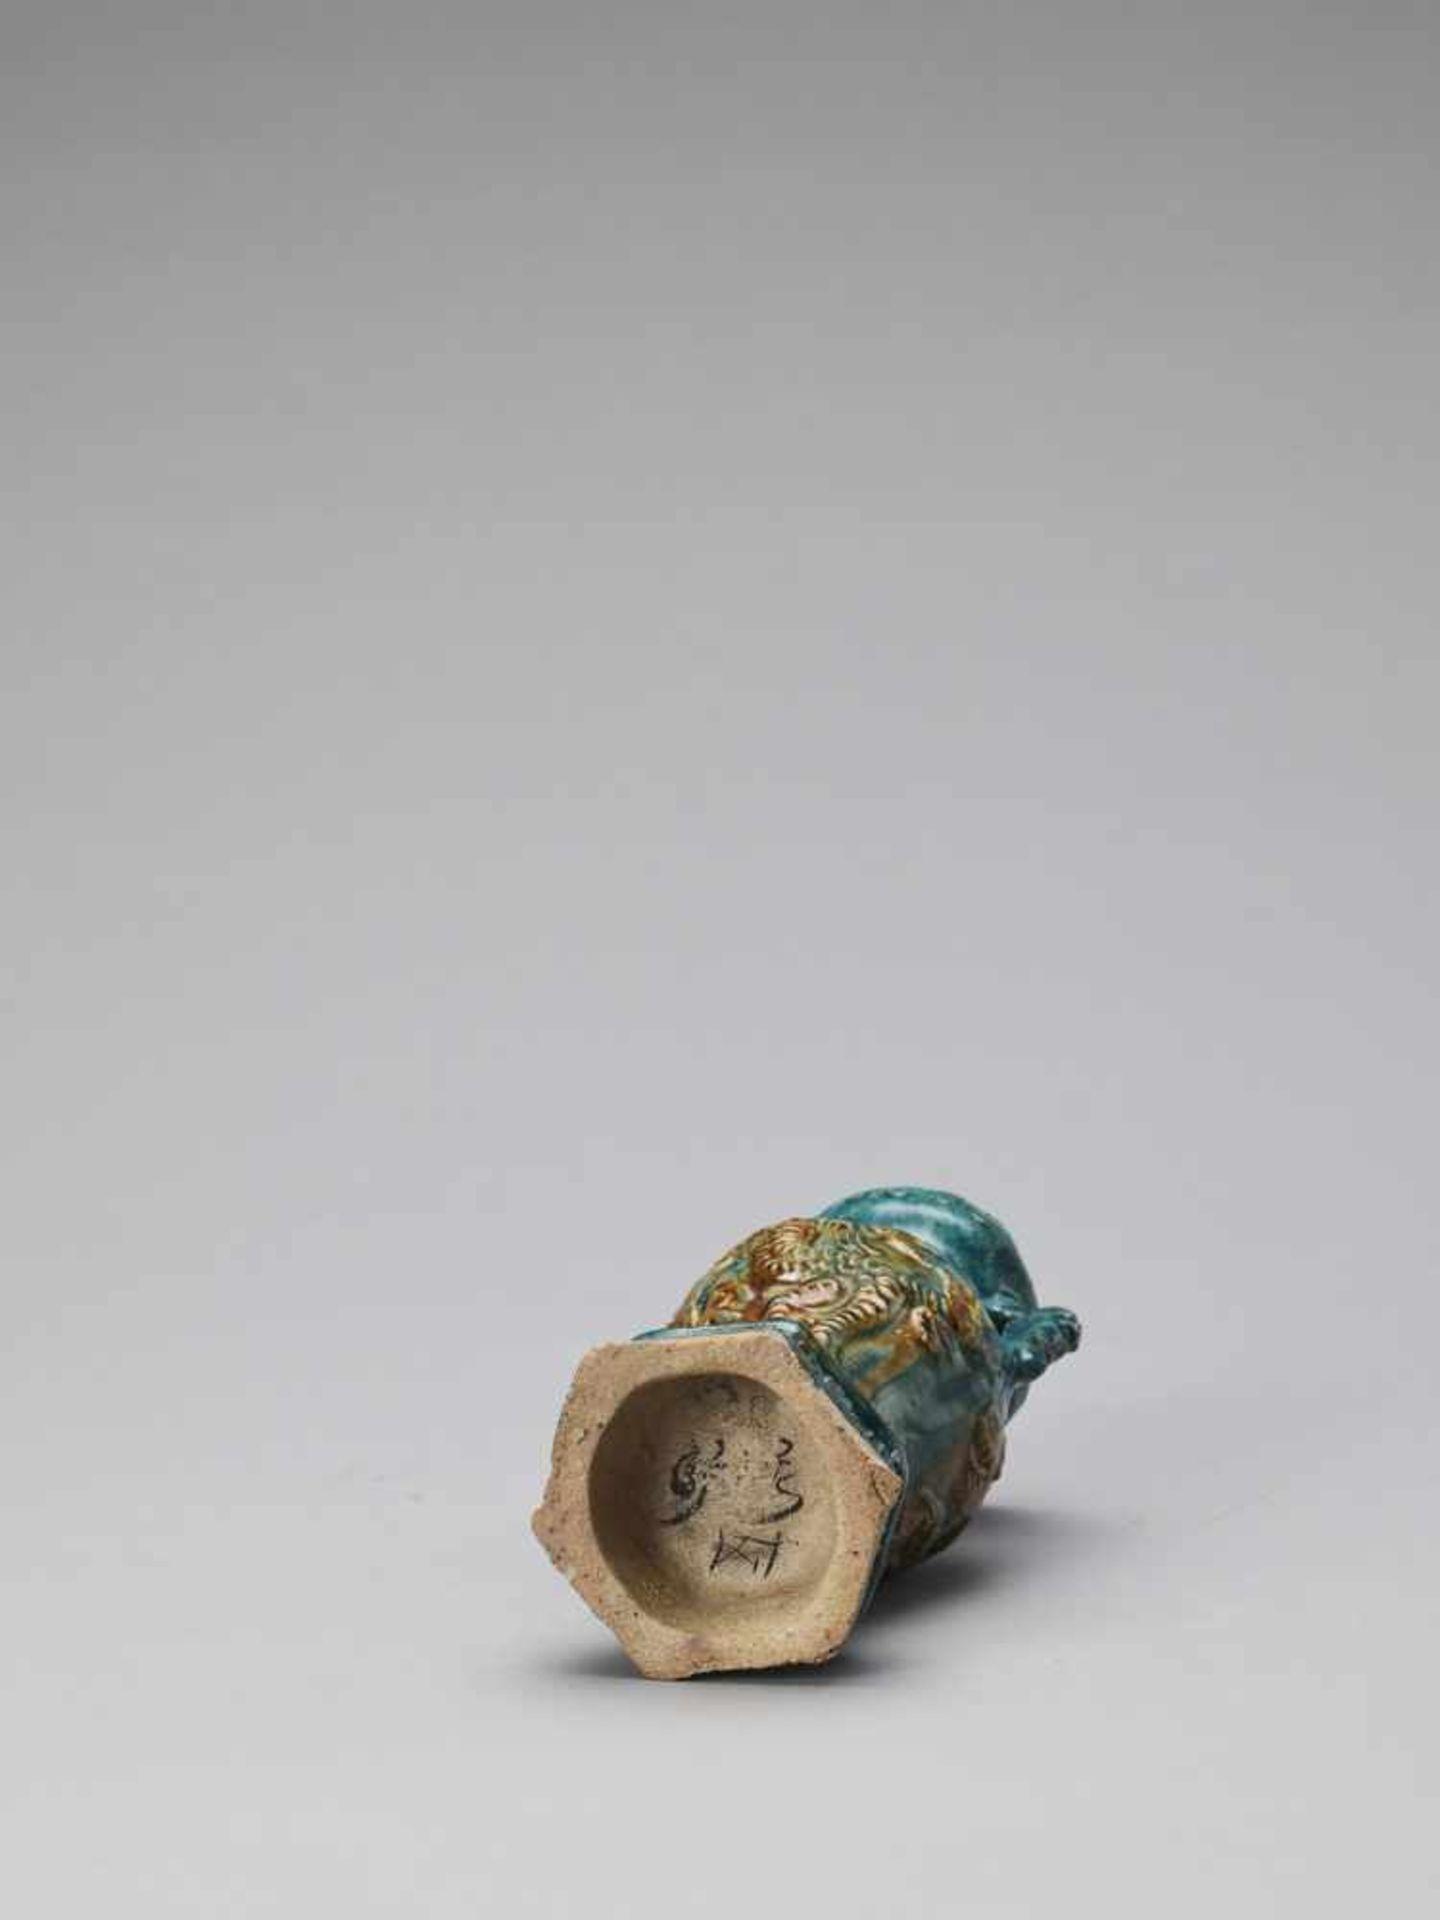 Los 401 - A SANCAI GLAZED POTTERY AMPHORA VASE WITH A MYTHICAL BEAST, 17th CENTURY